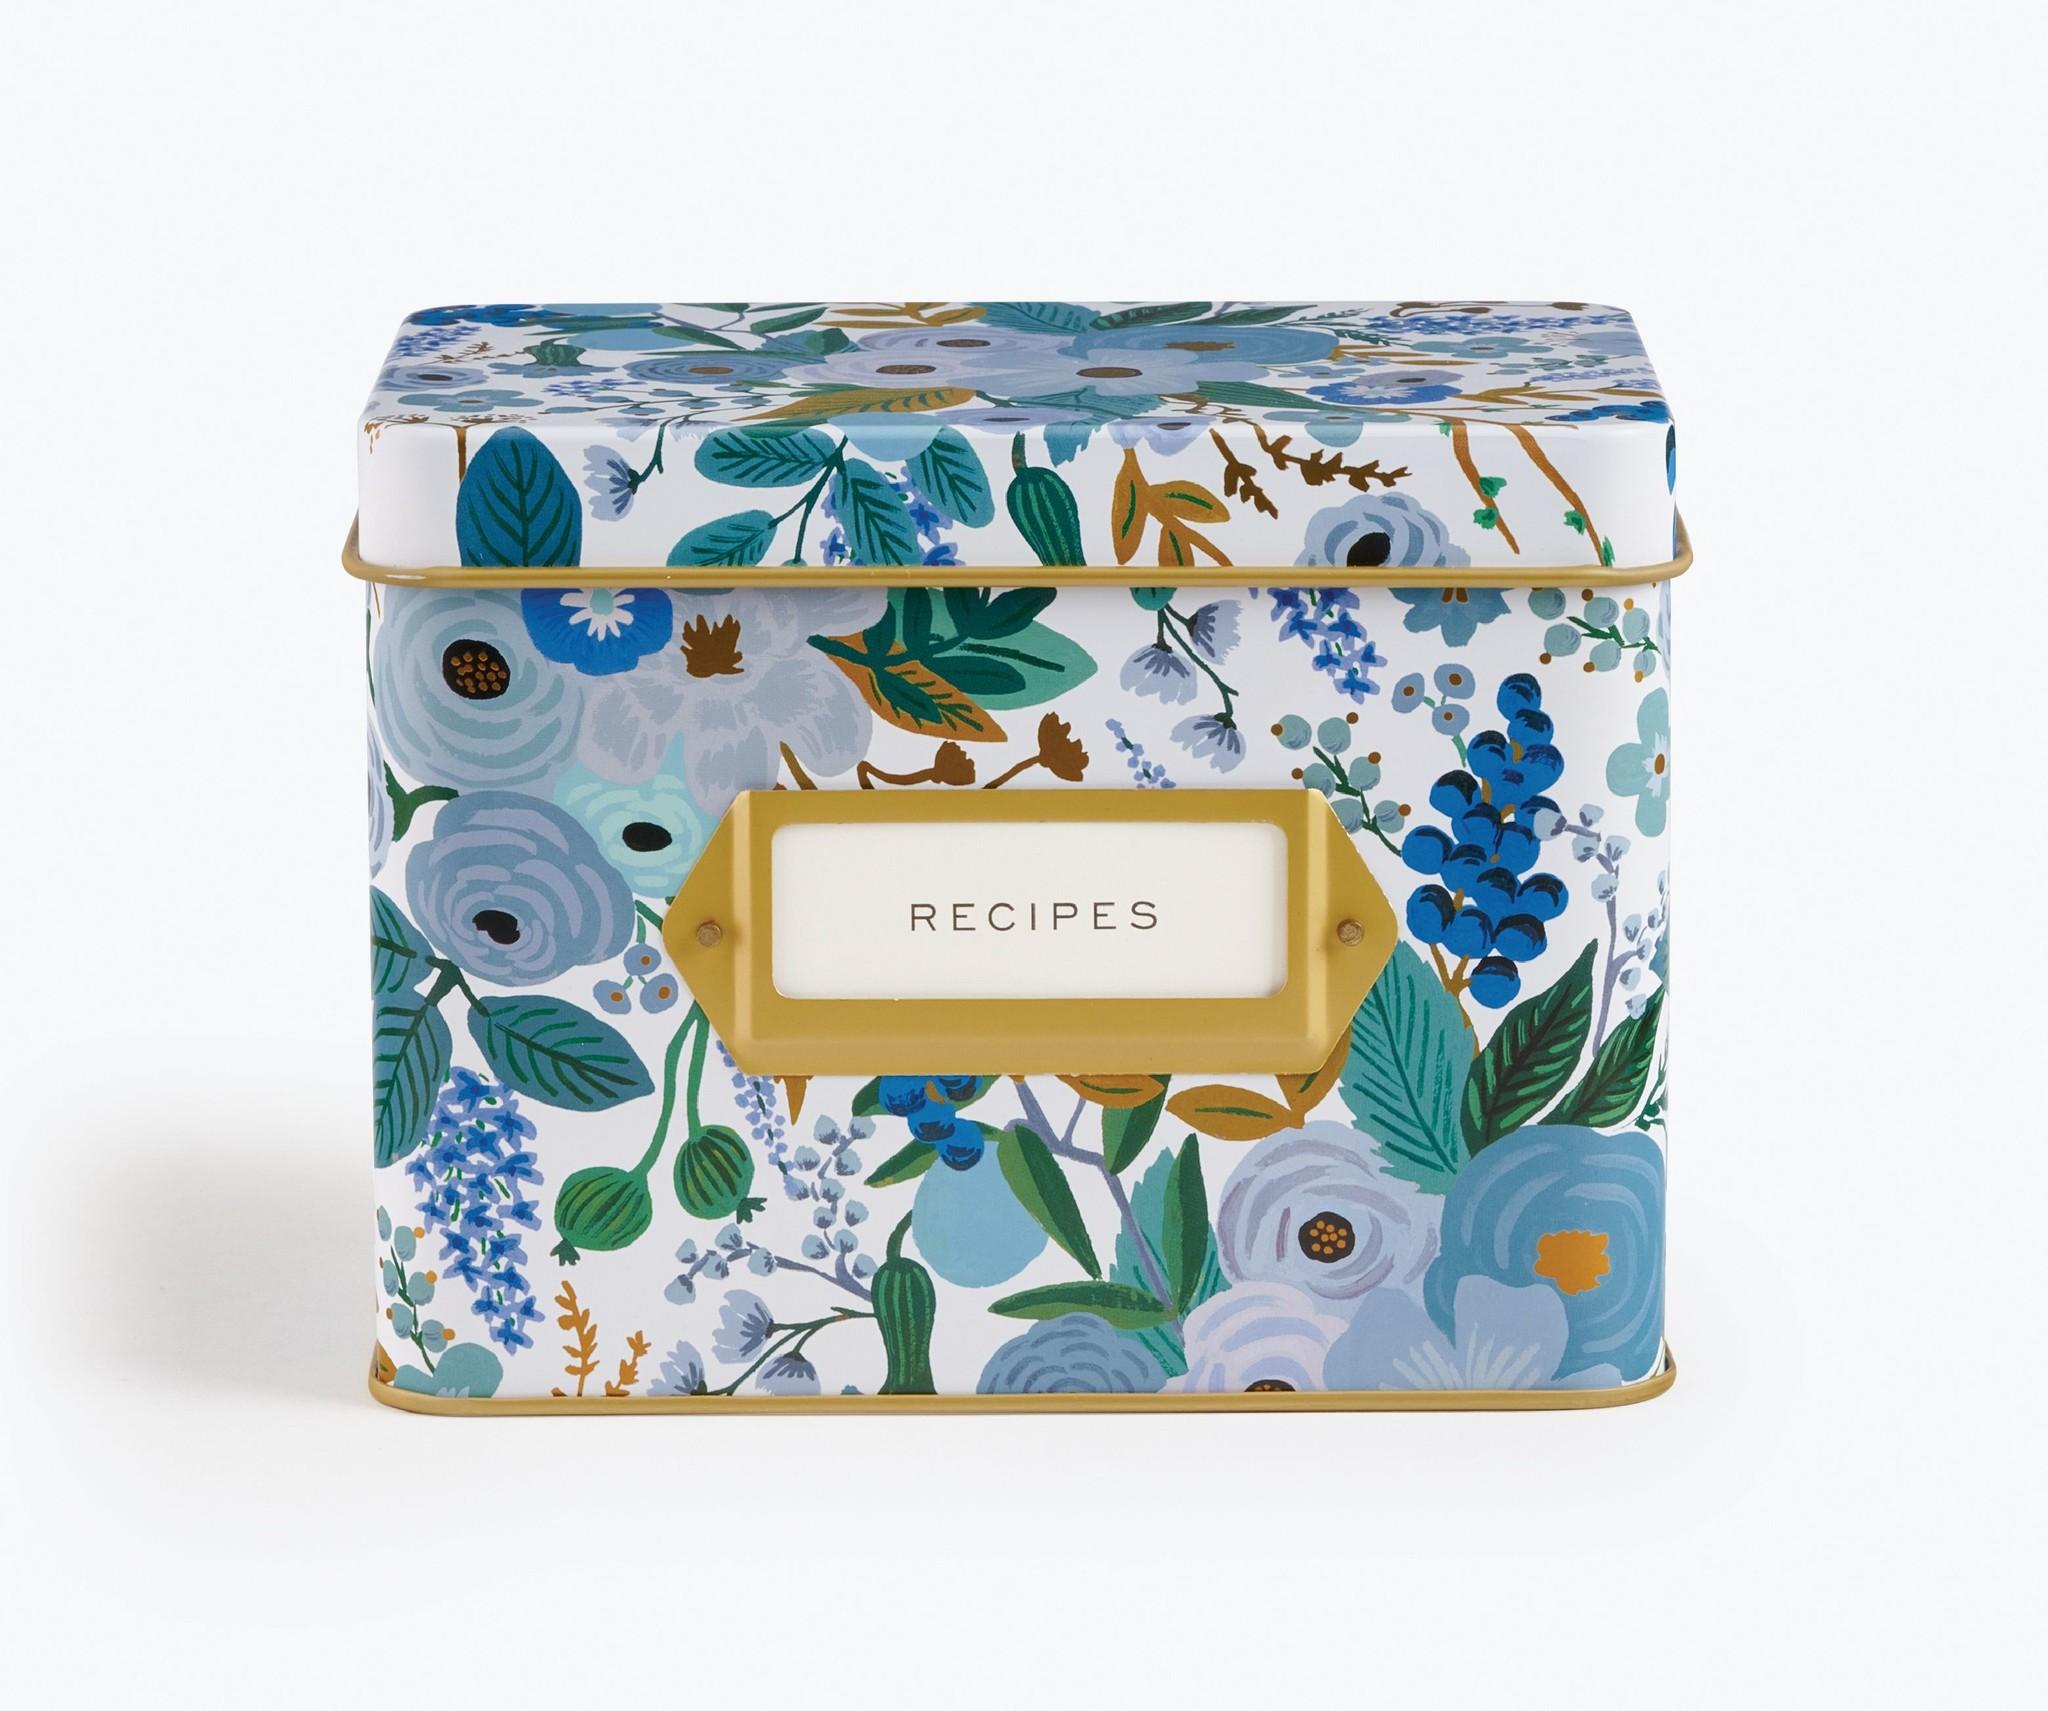 RIFLE PAPER COMPANY'S GARDEN PARTY BLUE TIN RECIPE BOX-1